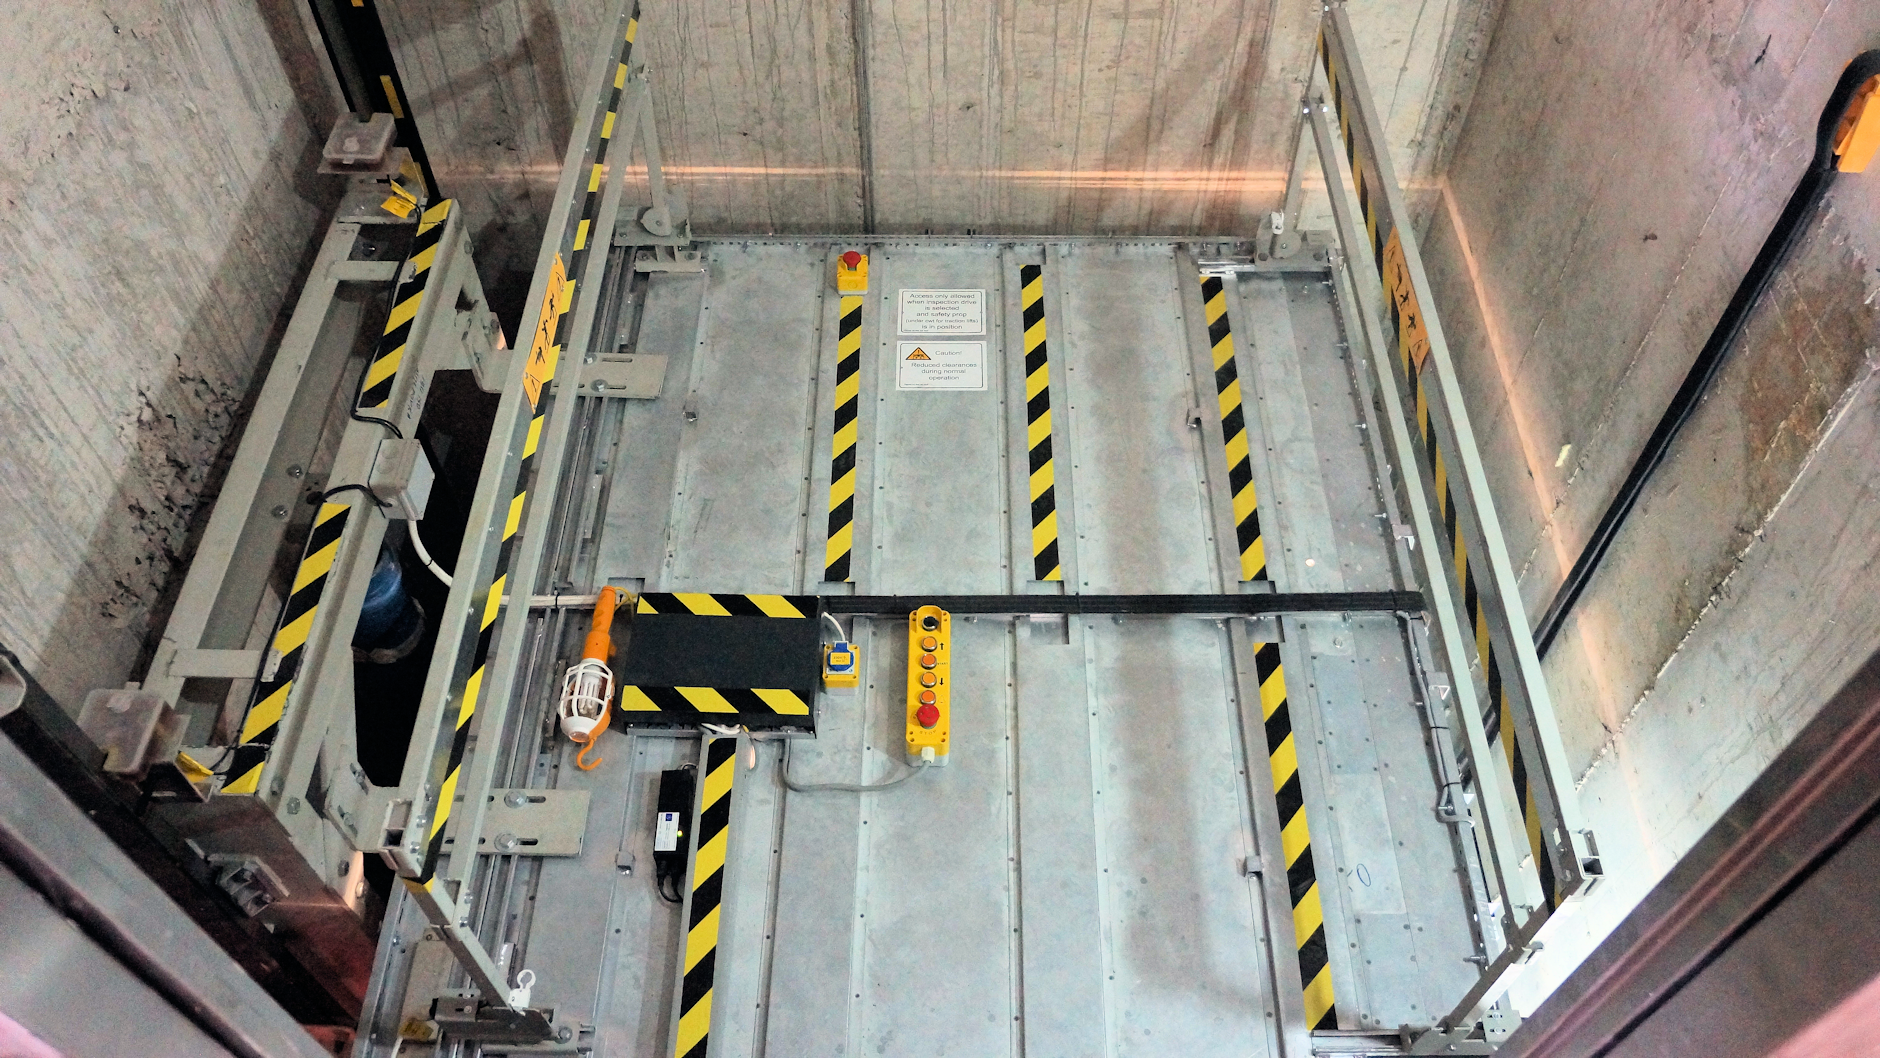 NEXTLEVEL ανελκυστήρες - ασανσερ kleemann μελετη - εγκατασταση - συντηρηση (4)